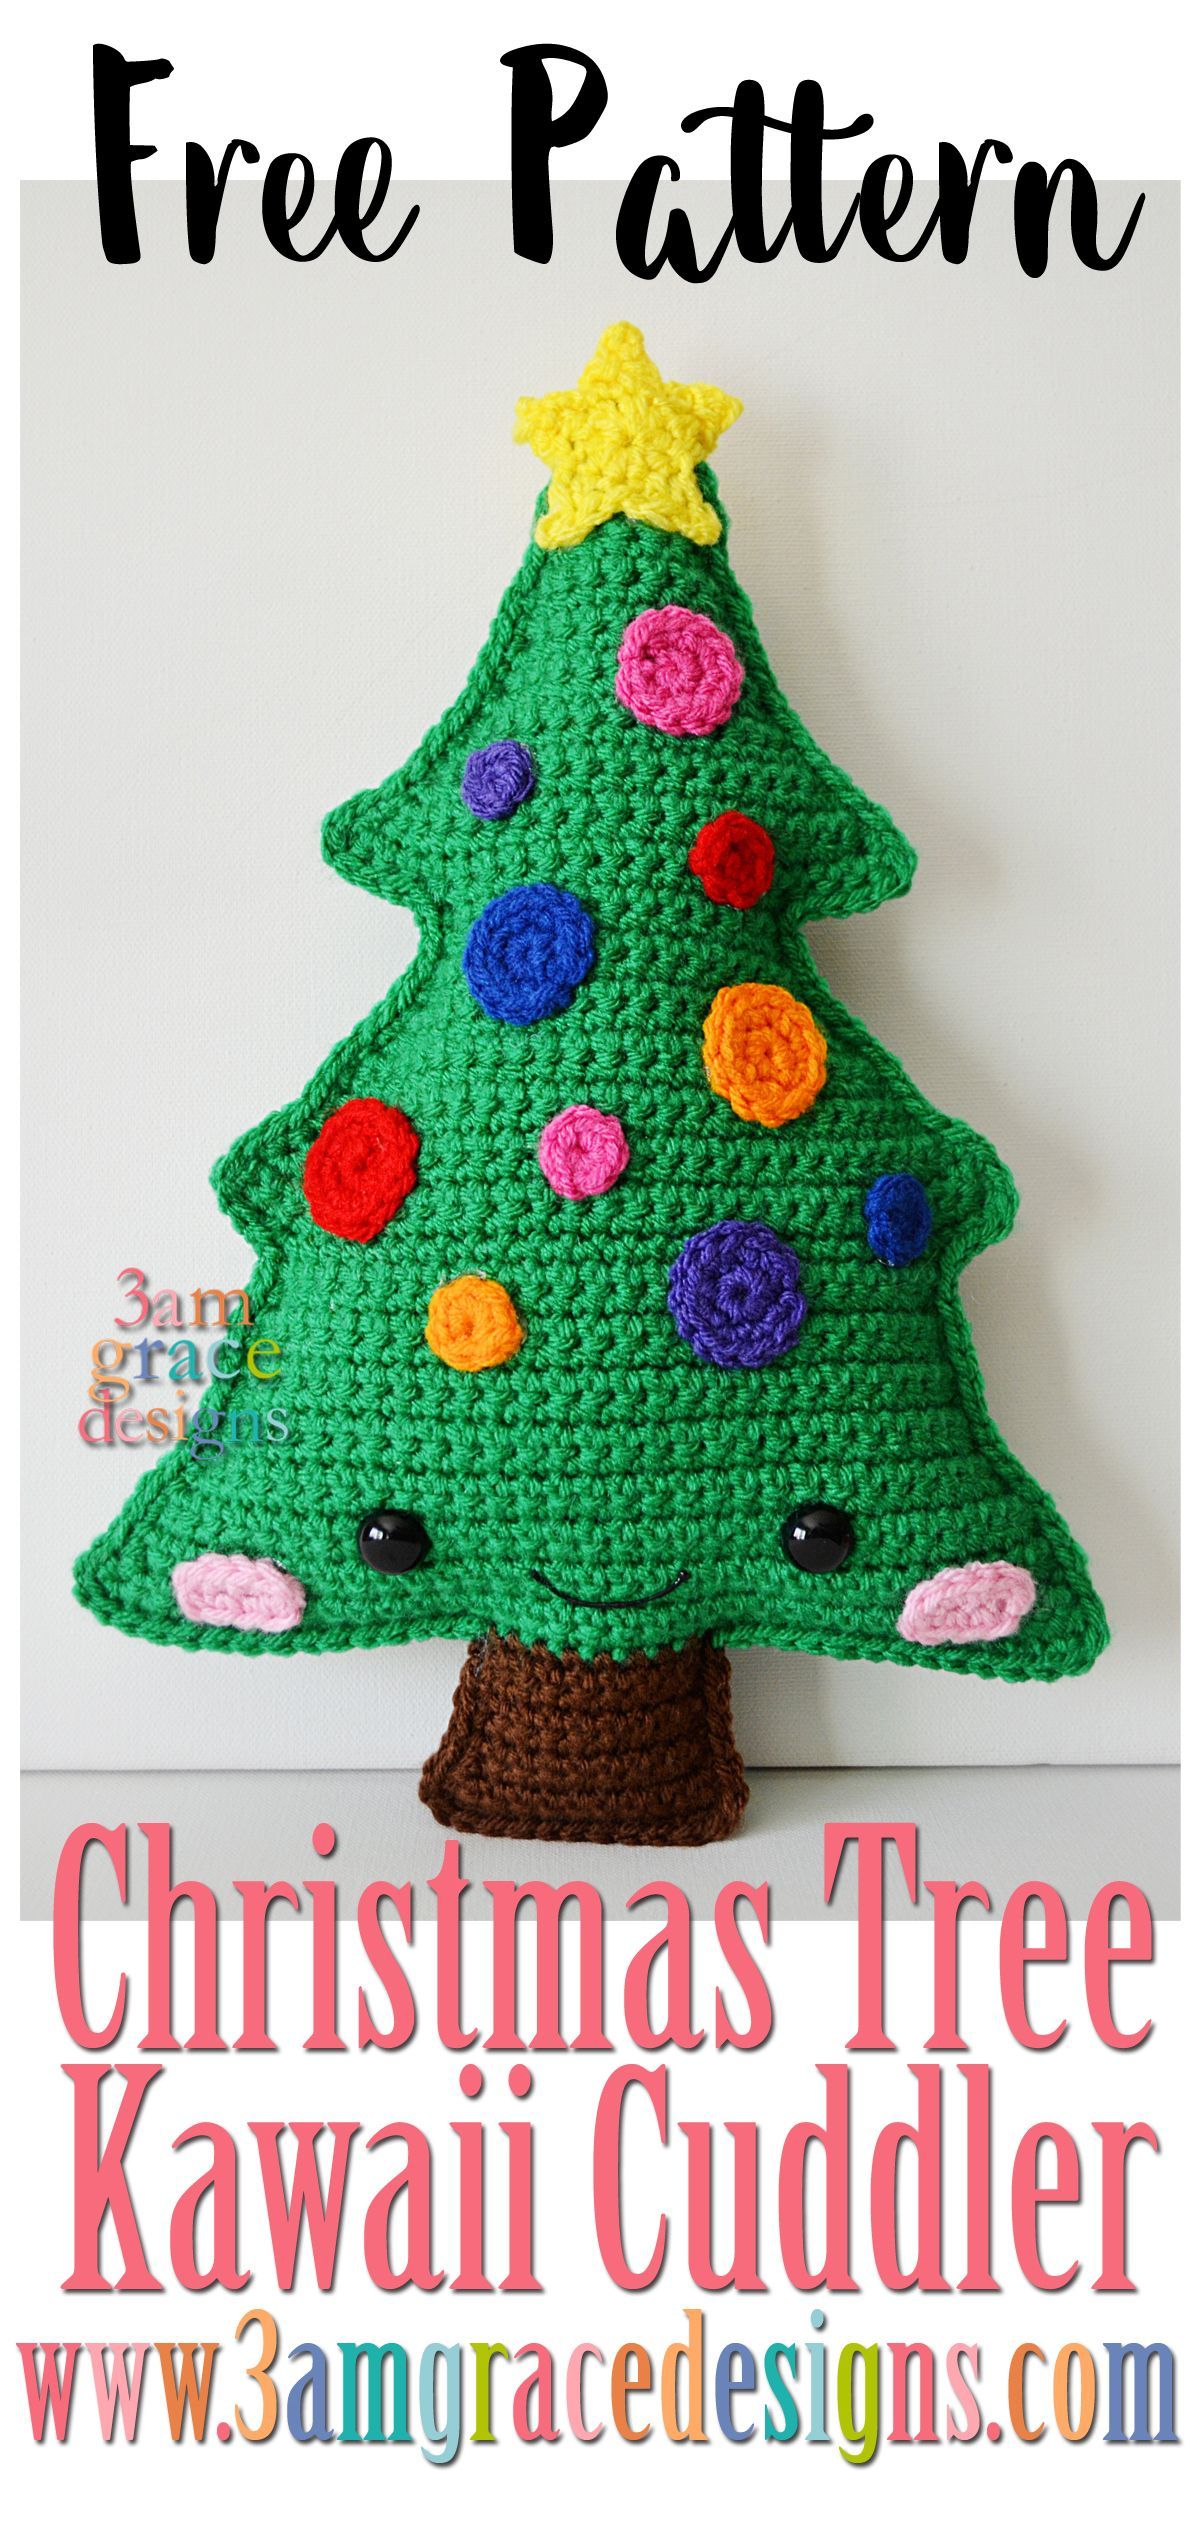 Christmas Tree Kawaii Cuddler Ideas Para Manualidades Uncinetto